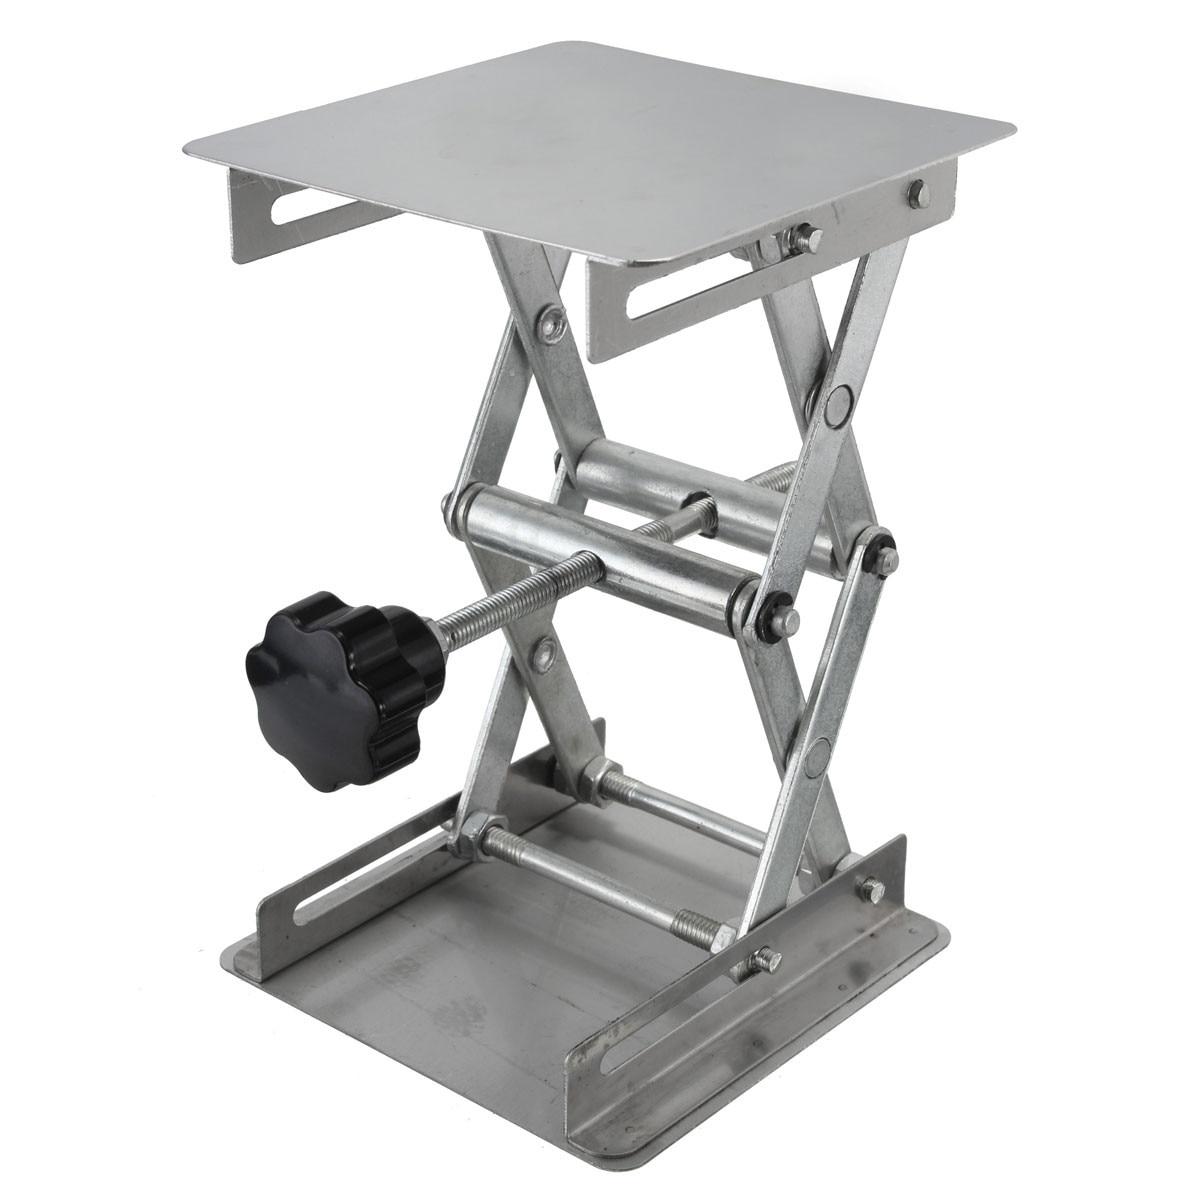 Adjustable Stainless Steel Laboratory Lab-Lift Lifting Platforms Jack Scissor Lift Platform / Foldable Lifting Table Pad